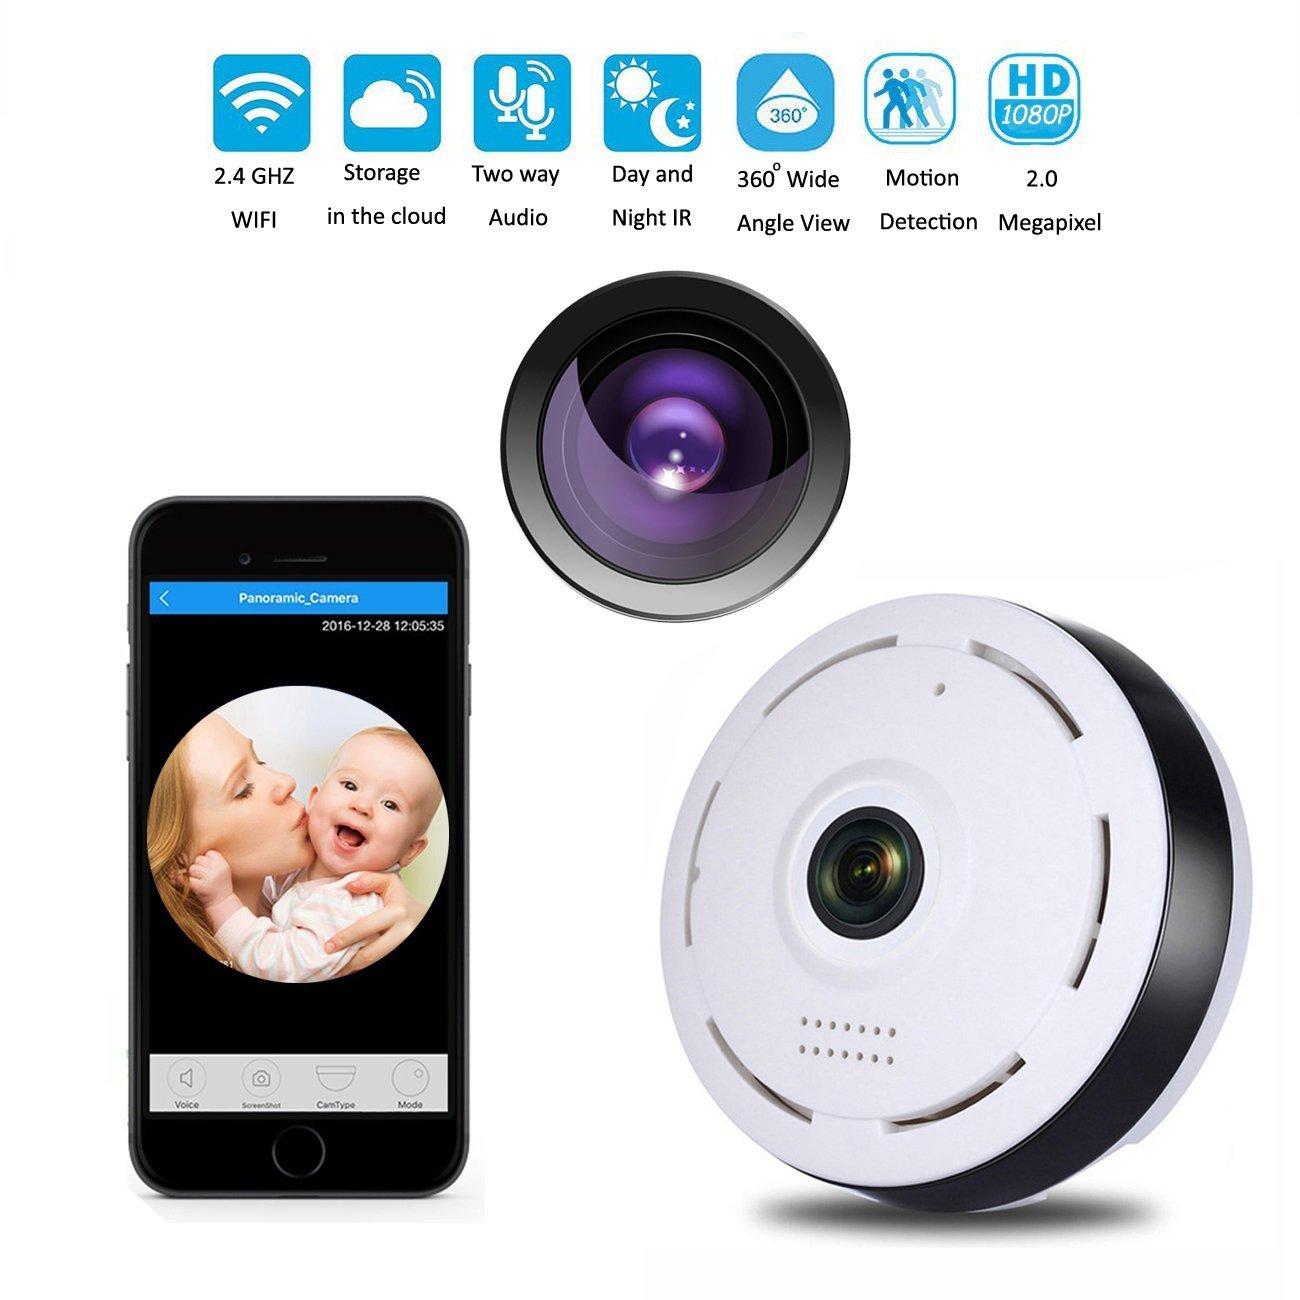 WiFi Wireless Panoramic Camera HD 360 Degree Night Vision Fisheye Security Camera white_UK plug